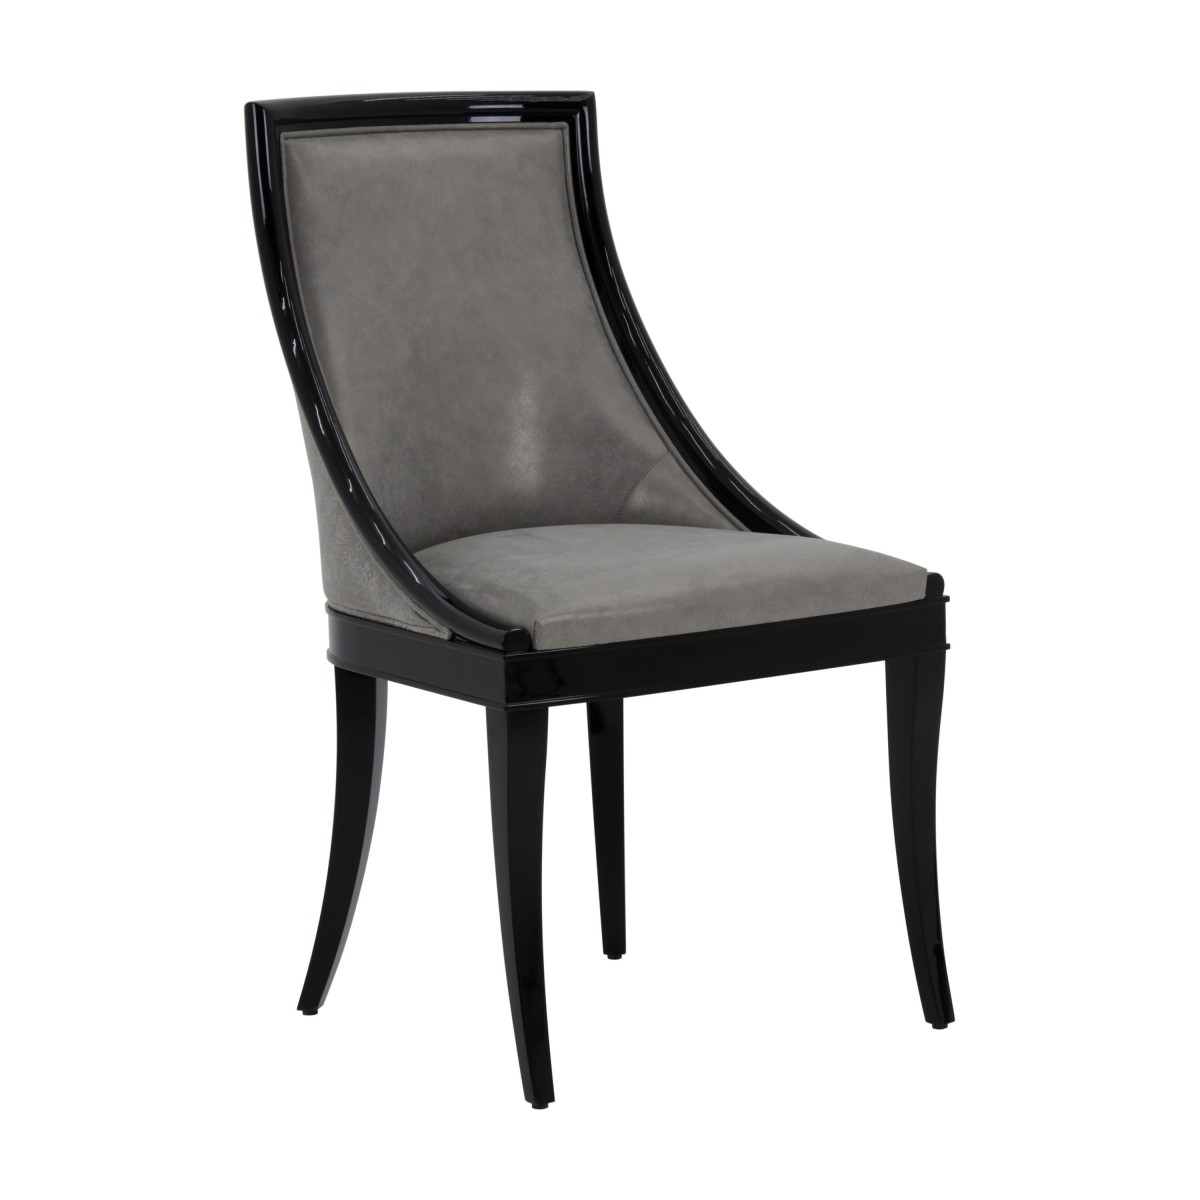 italian modern chair amina 2 6676